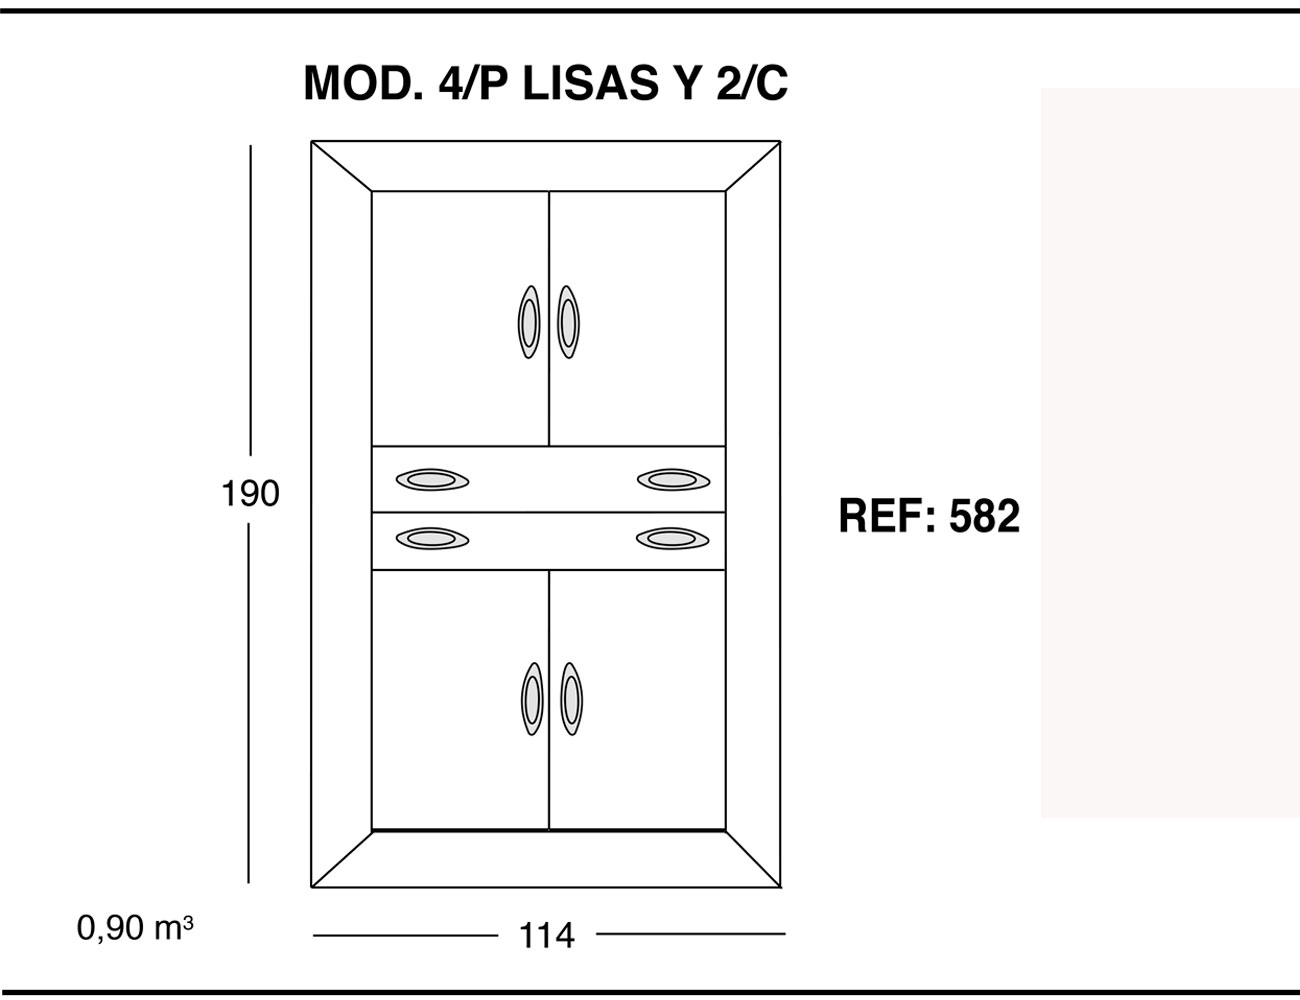 Modulo 4 puertas lisas 2 cajones 190 114